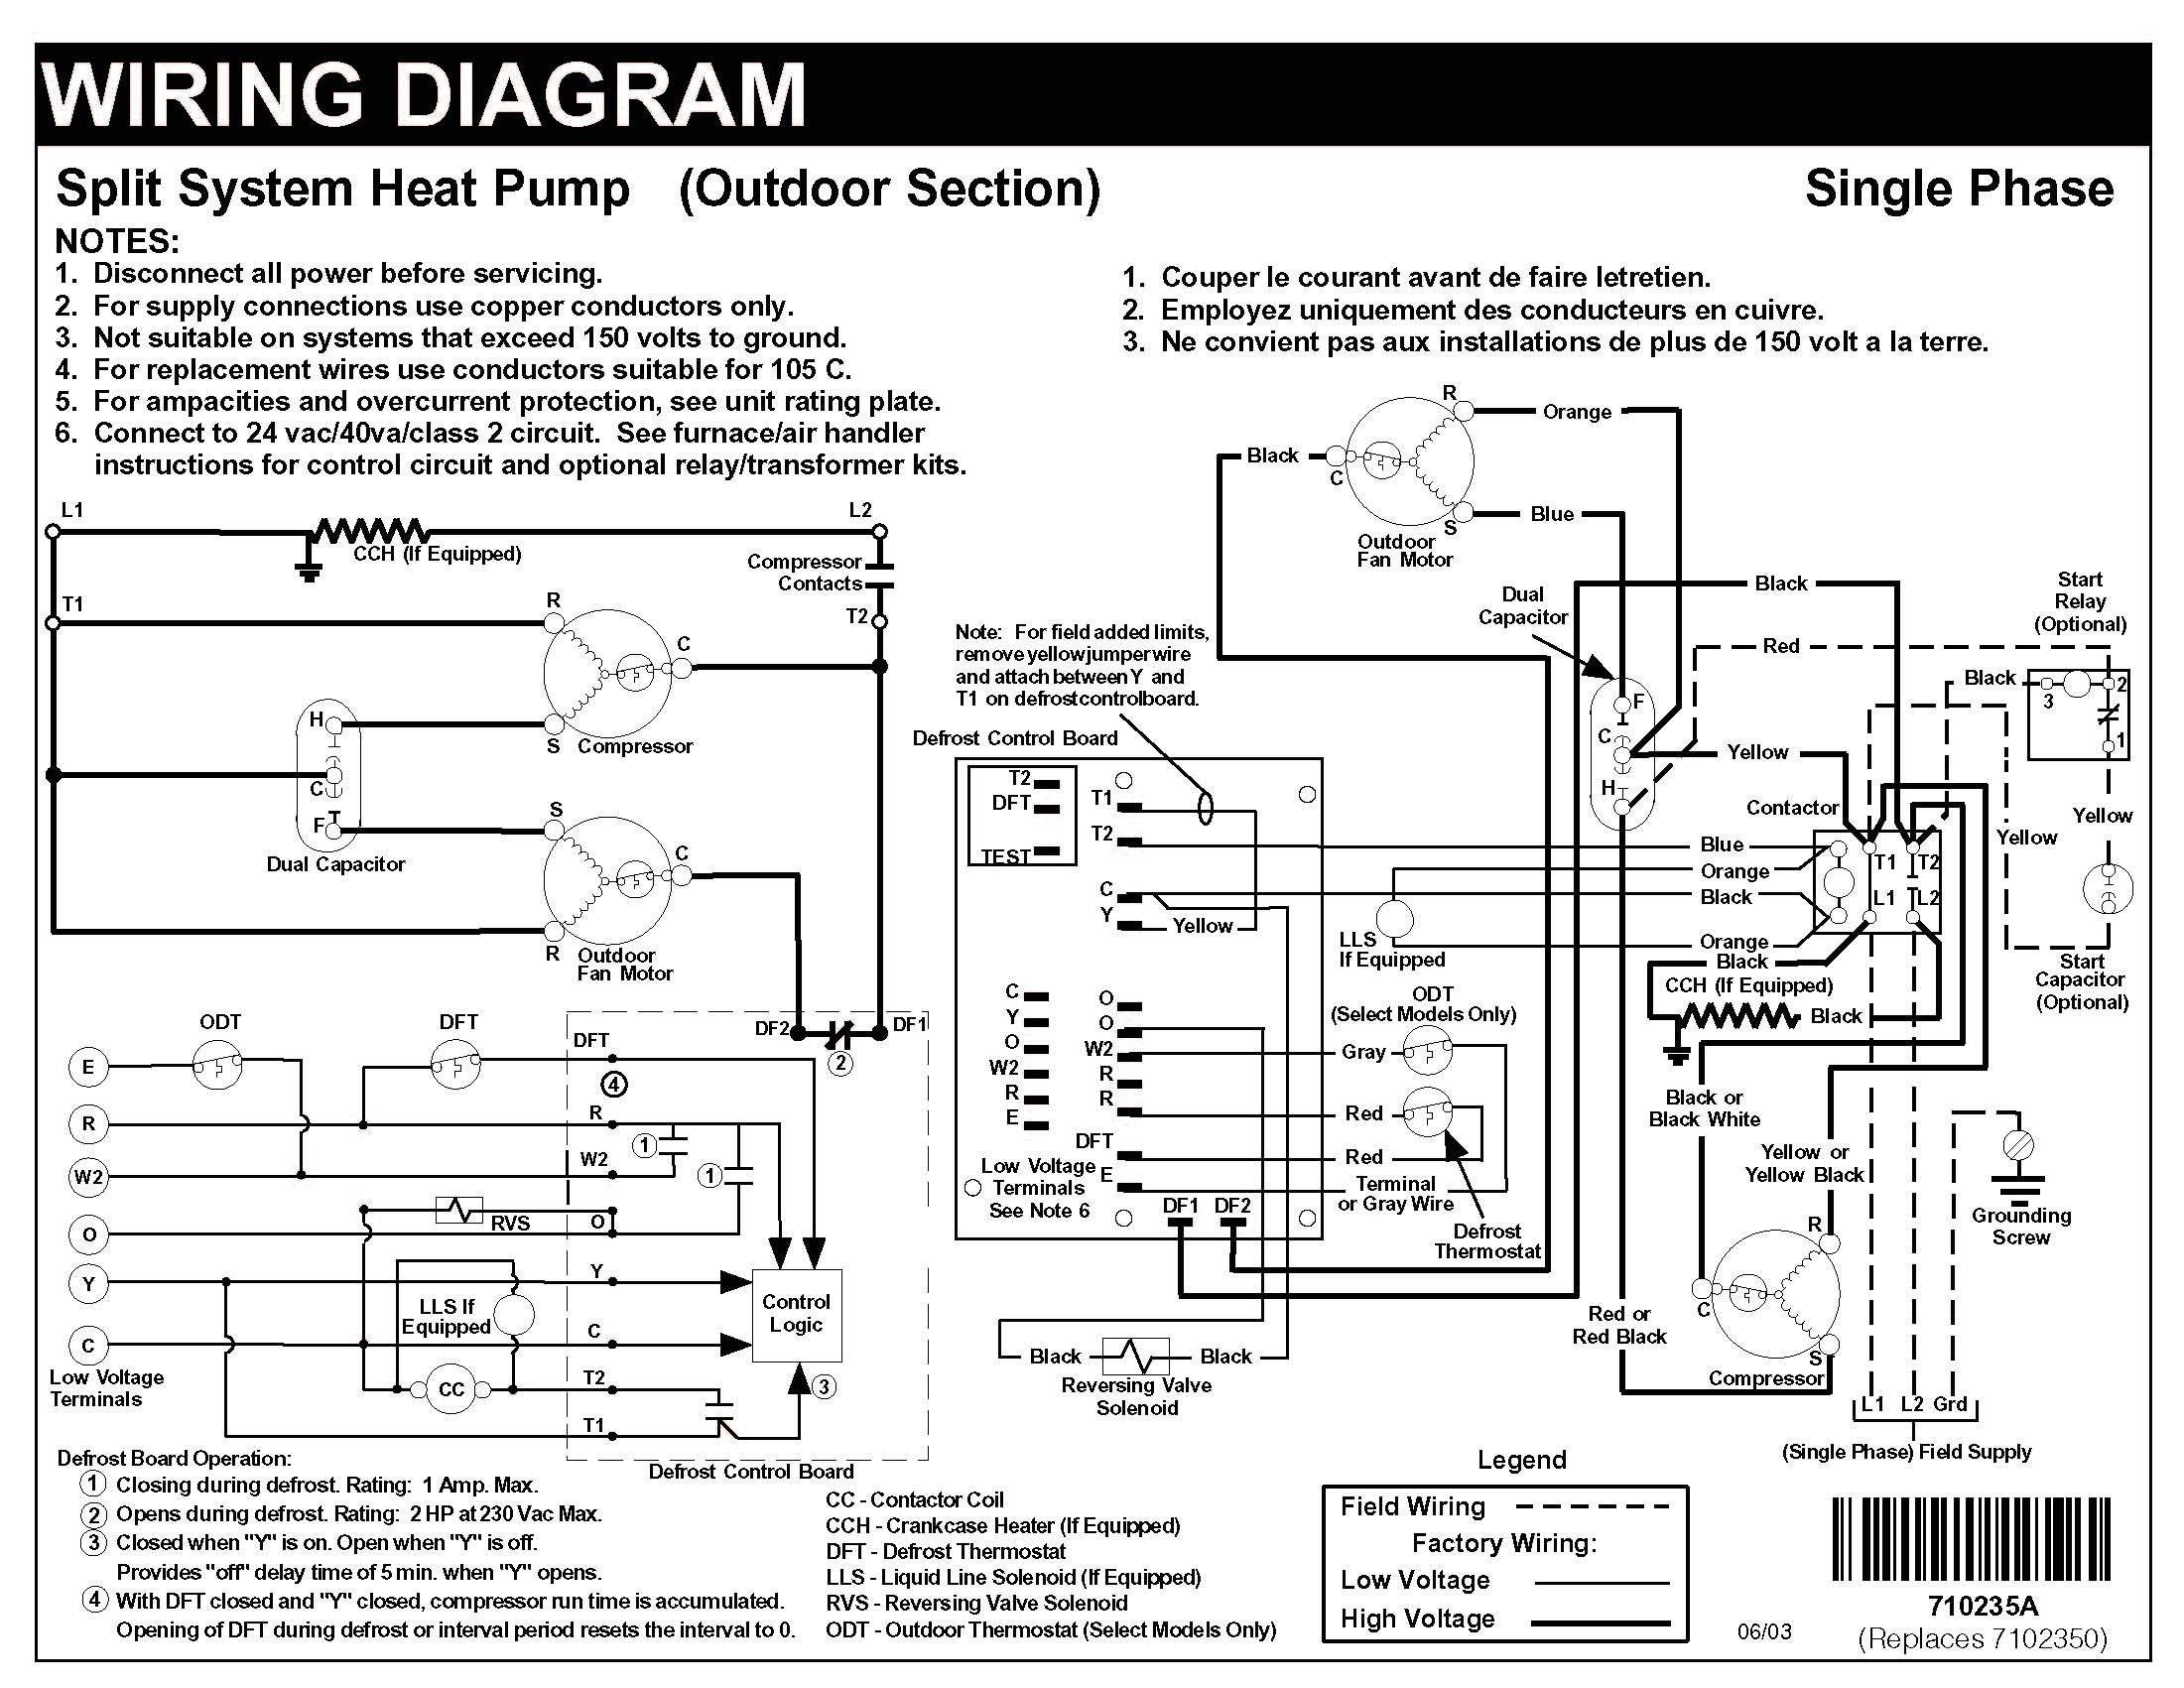 1995mitsubishi Eclipse Tranny Wiring Diagram Diagram] 06 Mitsubishi Durocross Wiring Diagrams Full Of 1995mitsubishi Eclipse Tranny Wiring Diagram